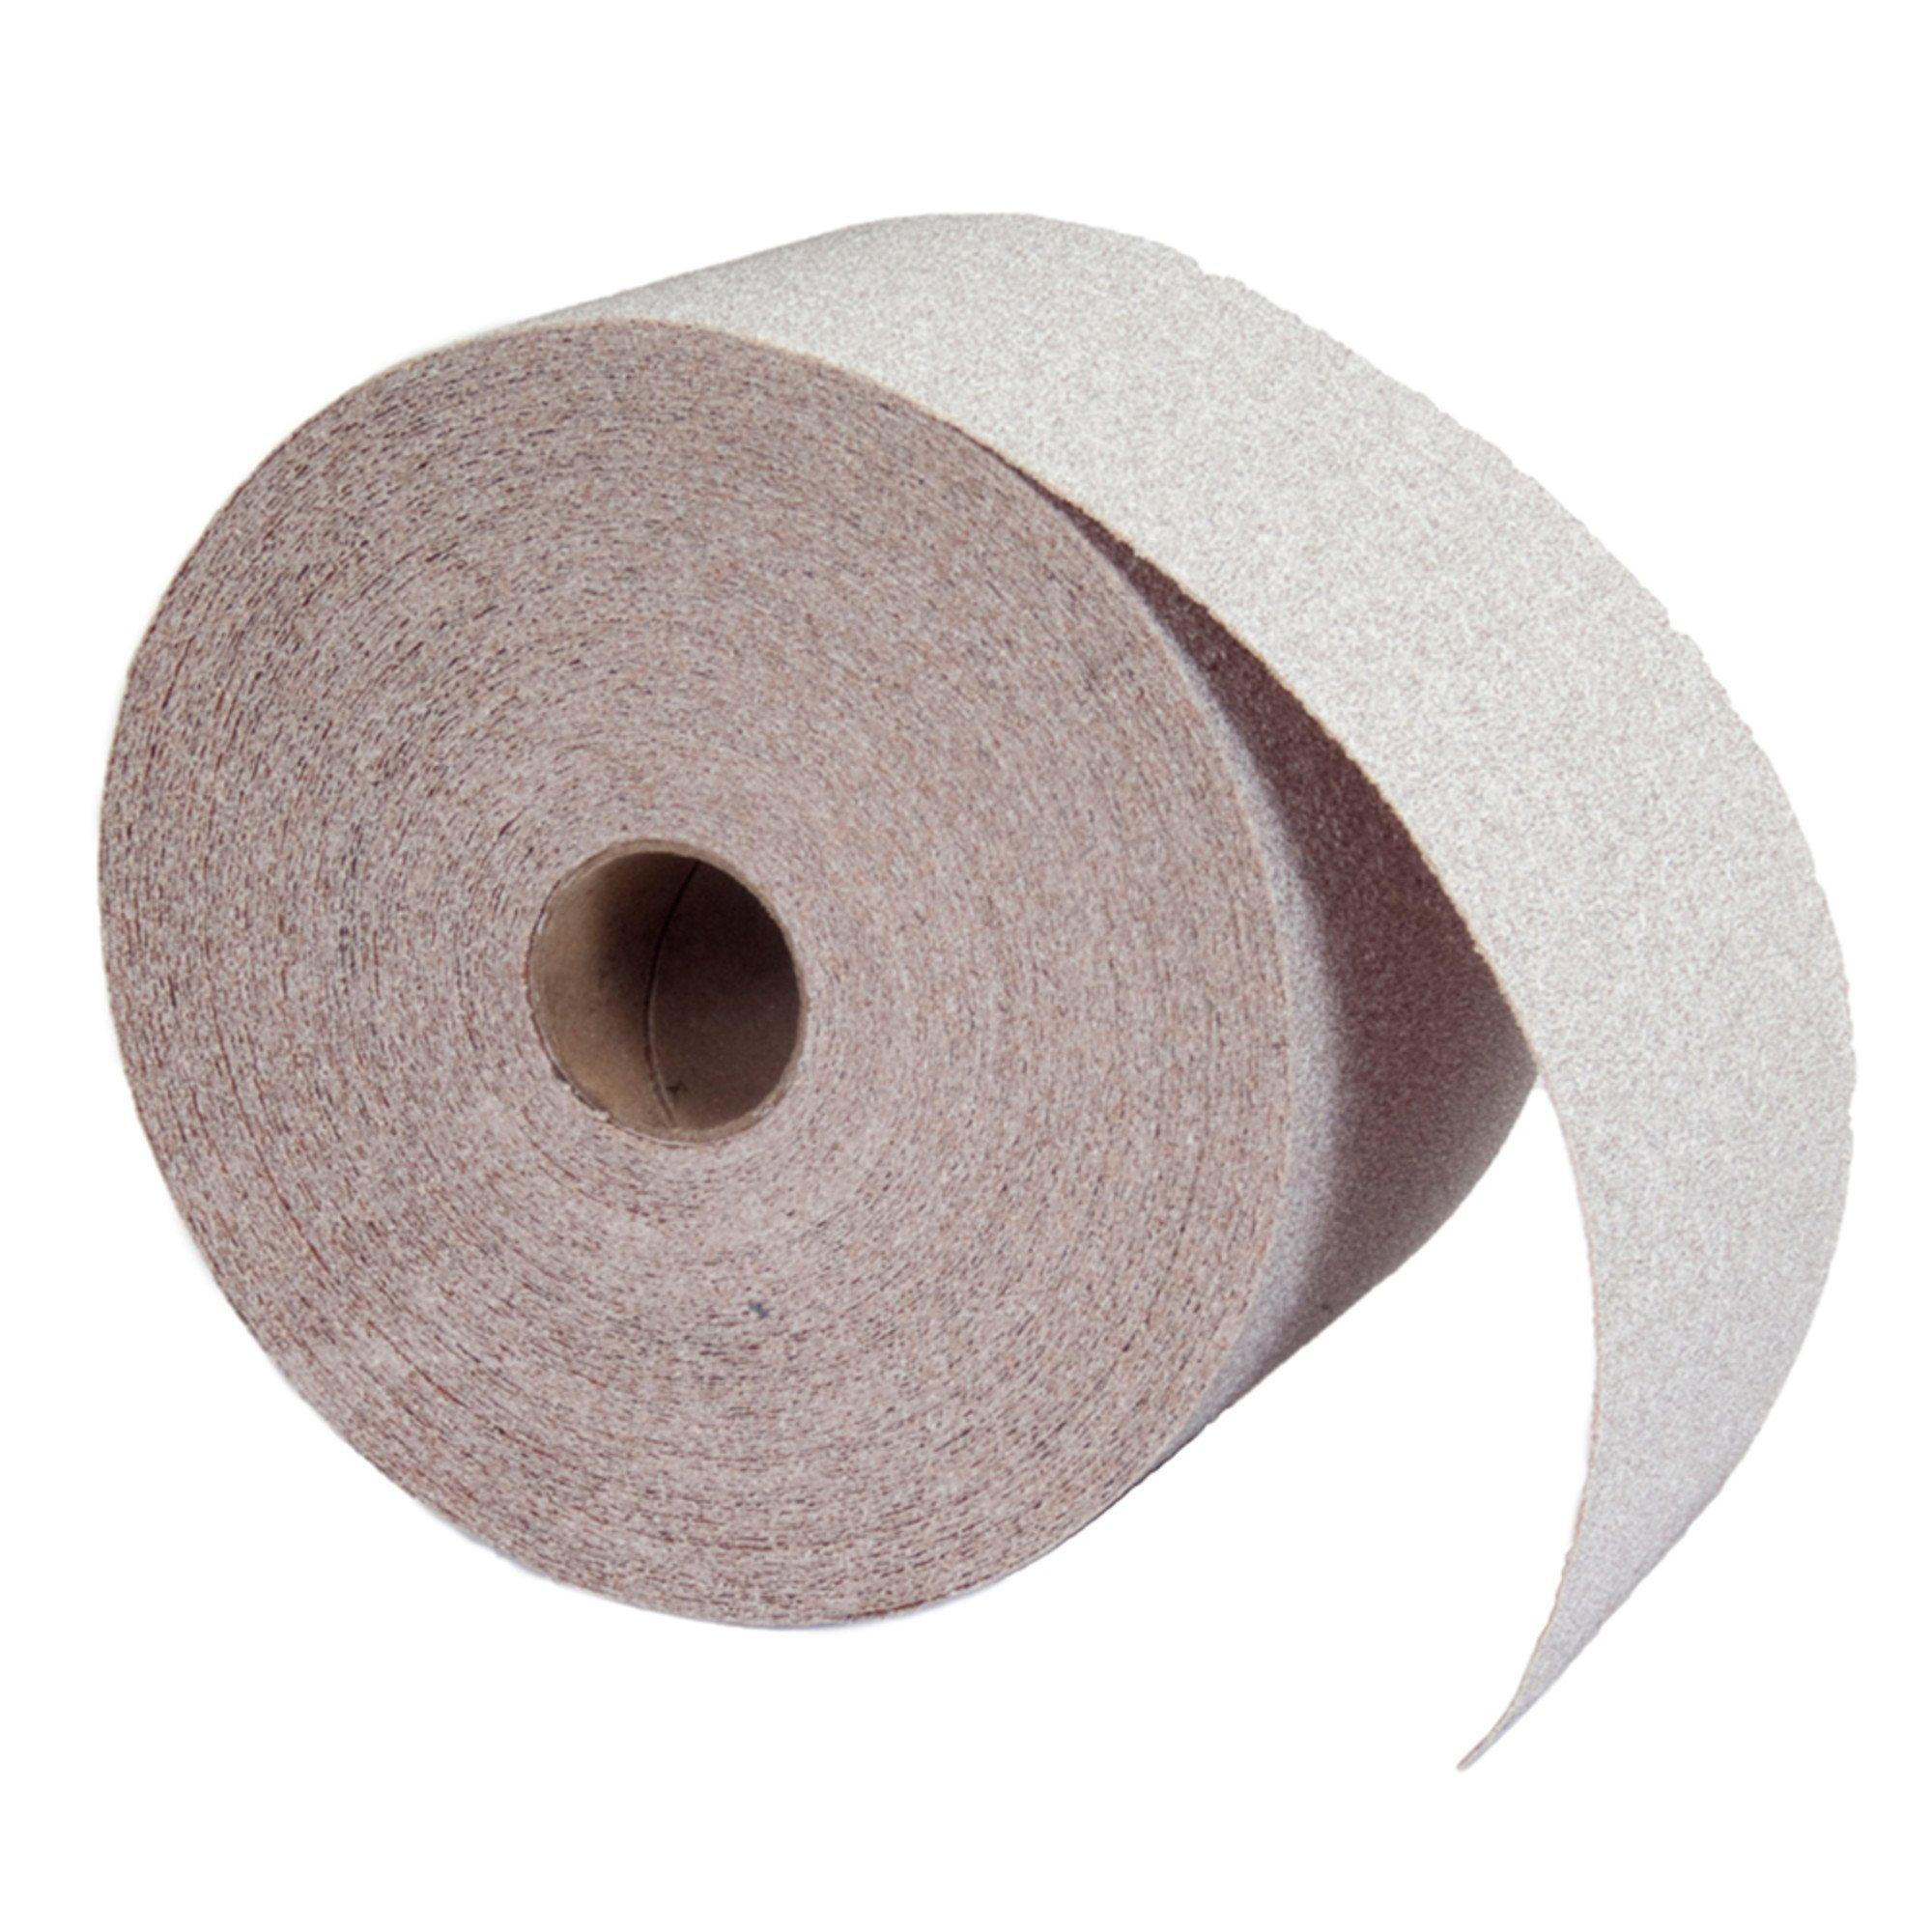 Norton A275 No-Fil Adalox Abrasive Roll, Paper Backing, Pressure Sensitive Adhesive, Aluminum Oxide, Waterproof, Roll 2-3/4'' Width x 45yd Length, Grit 600 (Pack of 1)